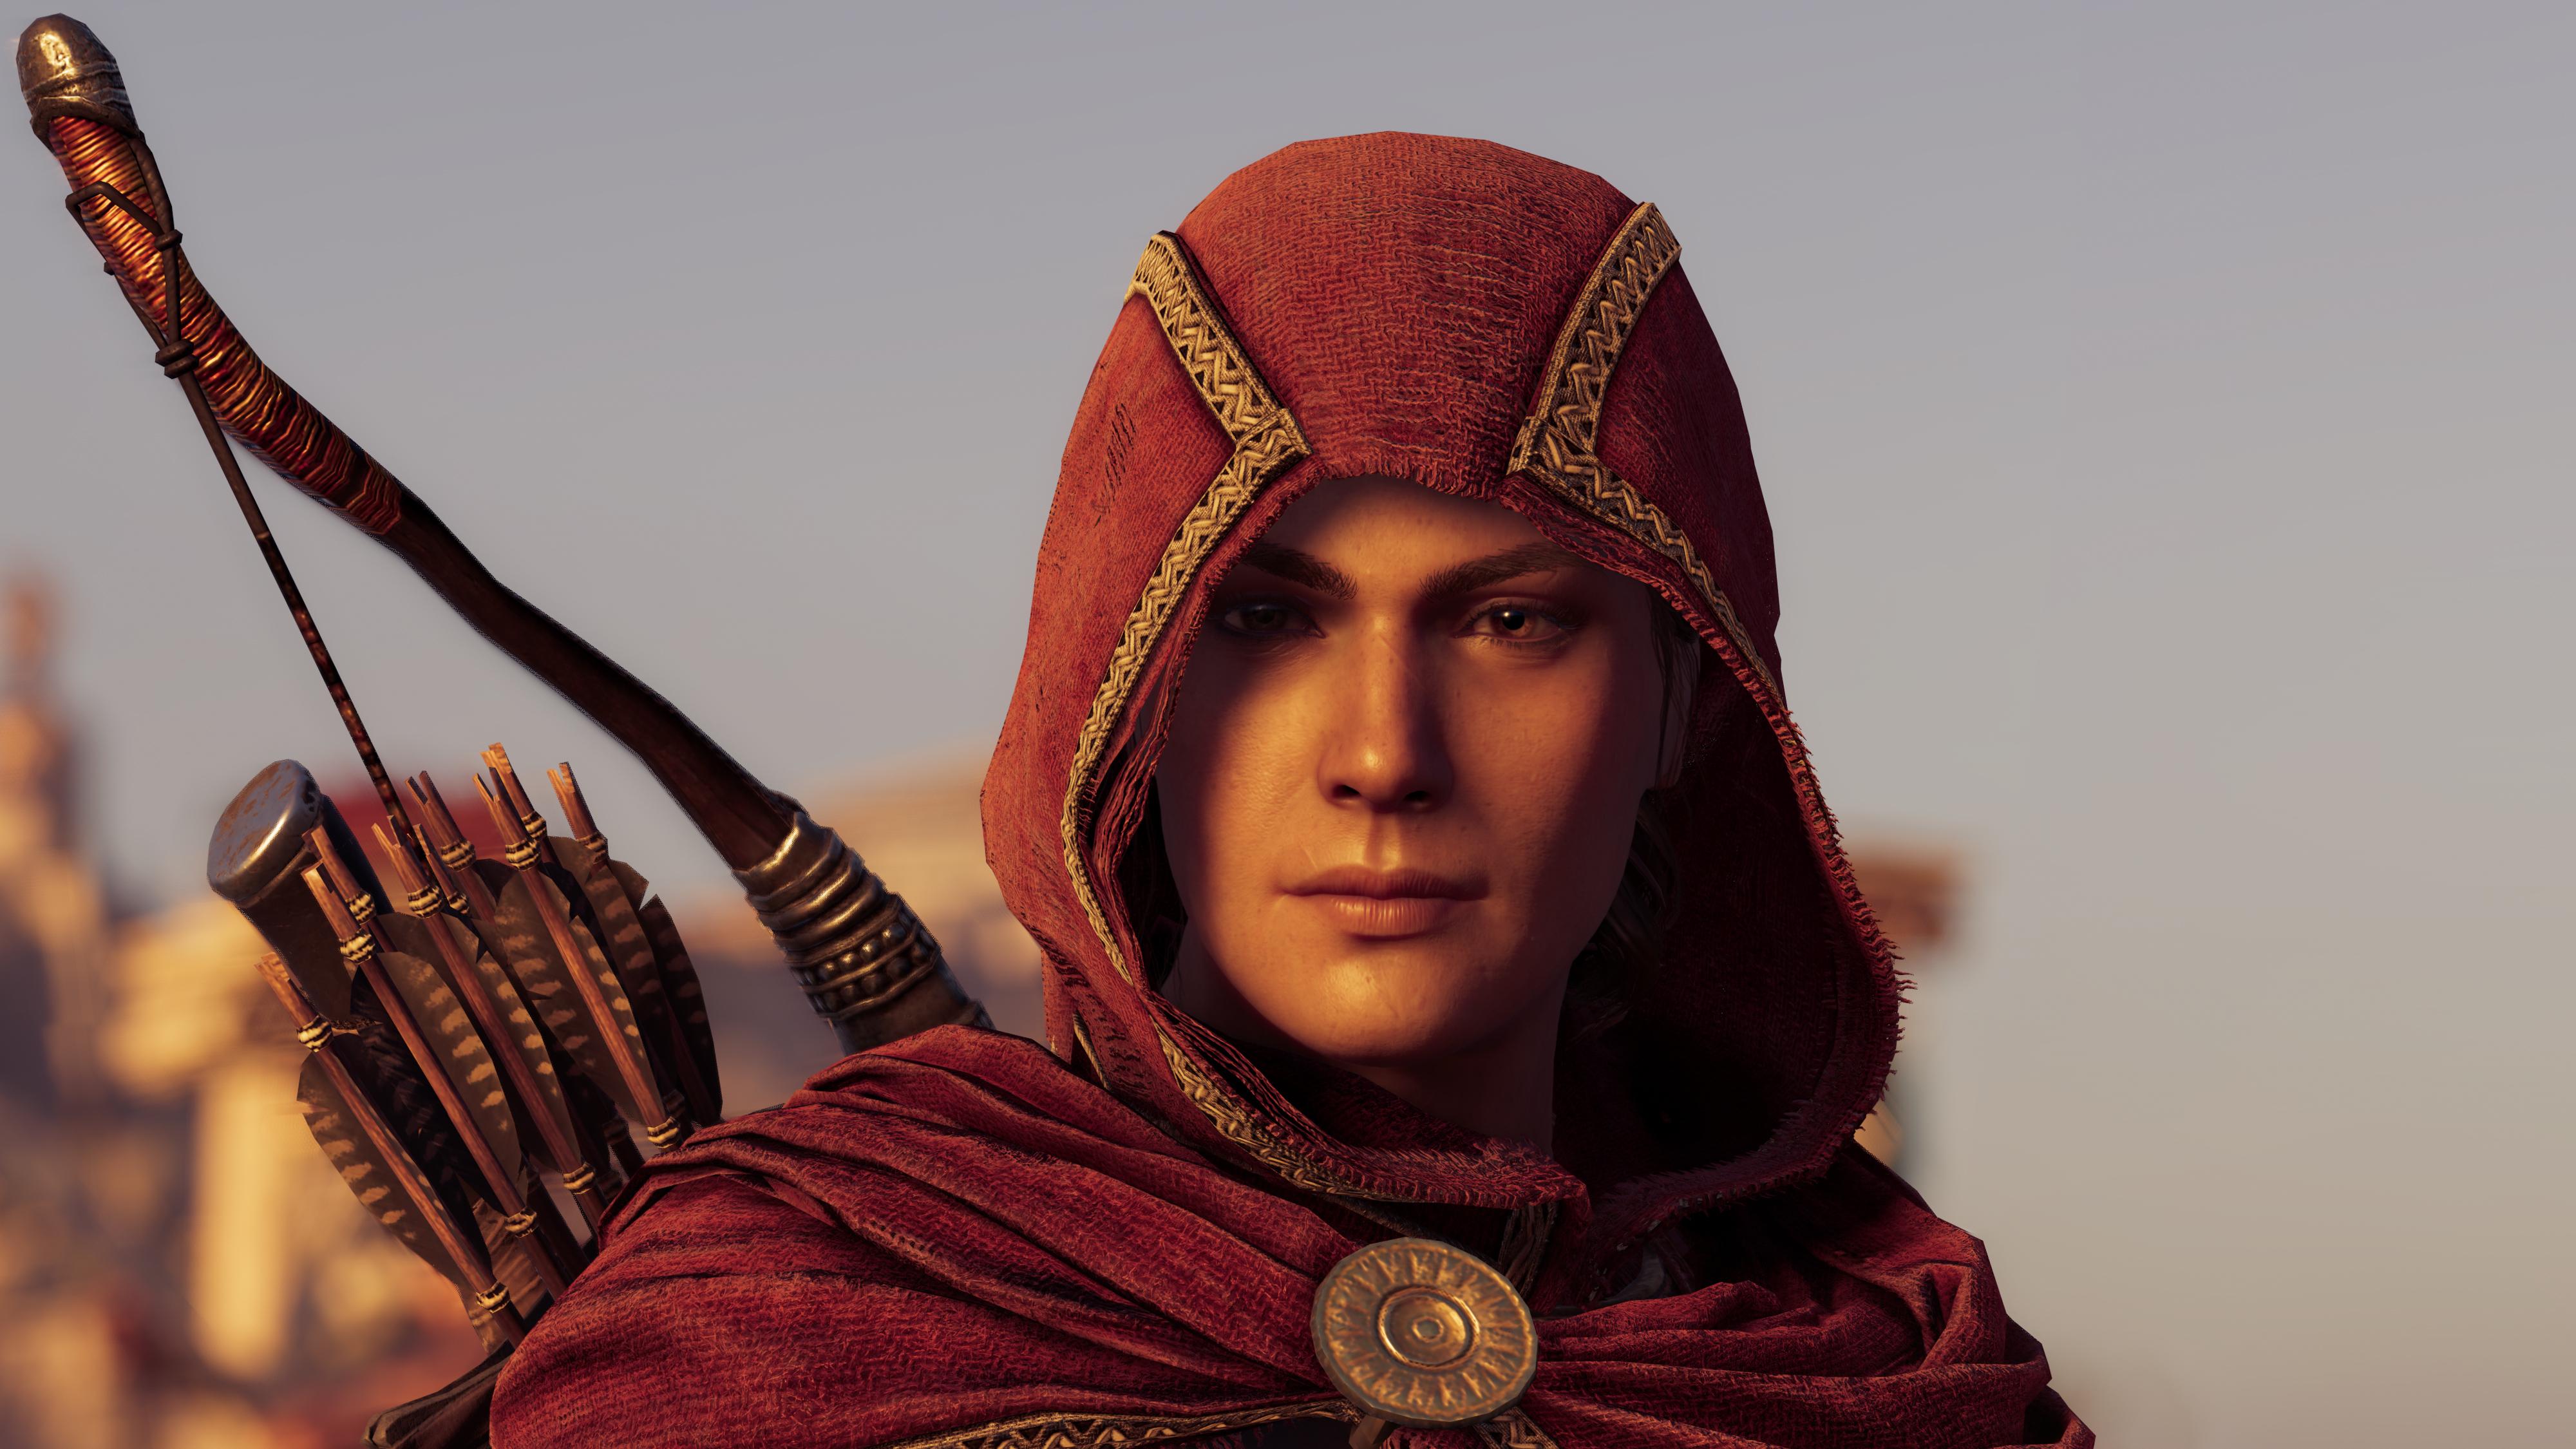 Kassandra In Assassins Creed Odyssey 4k Hd Games 4k Wallpapers